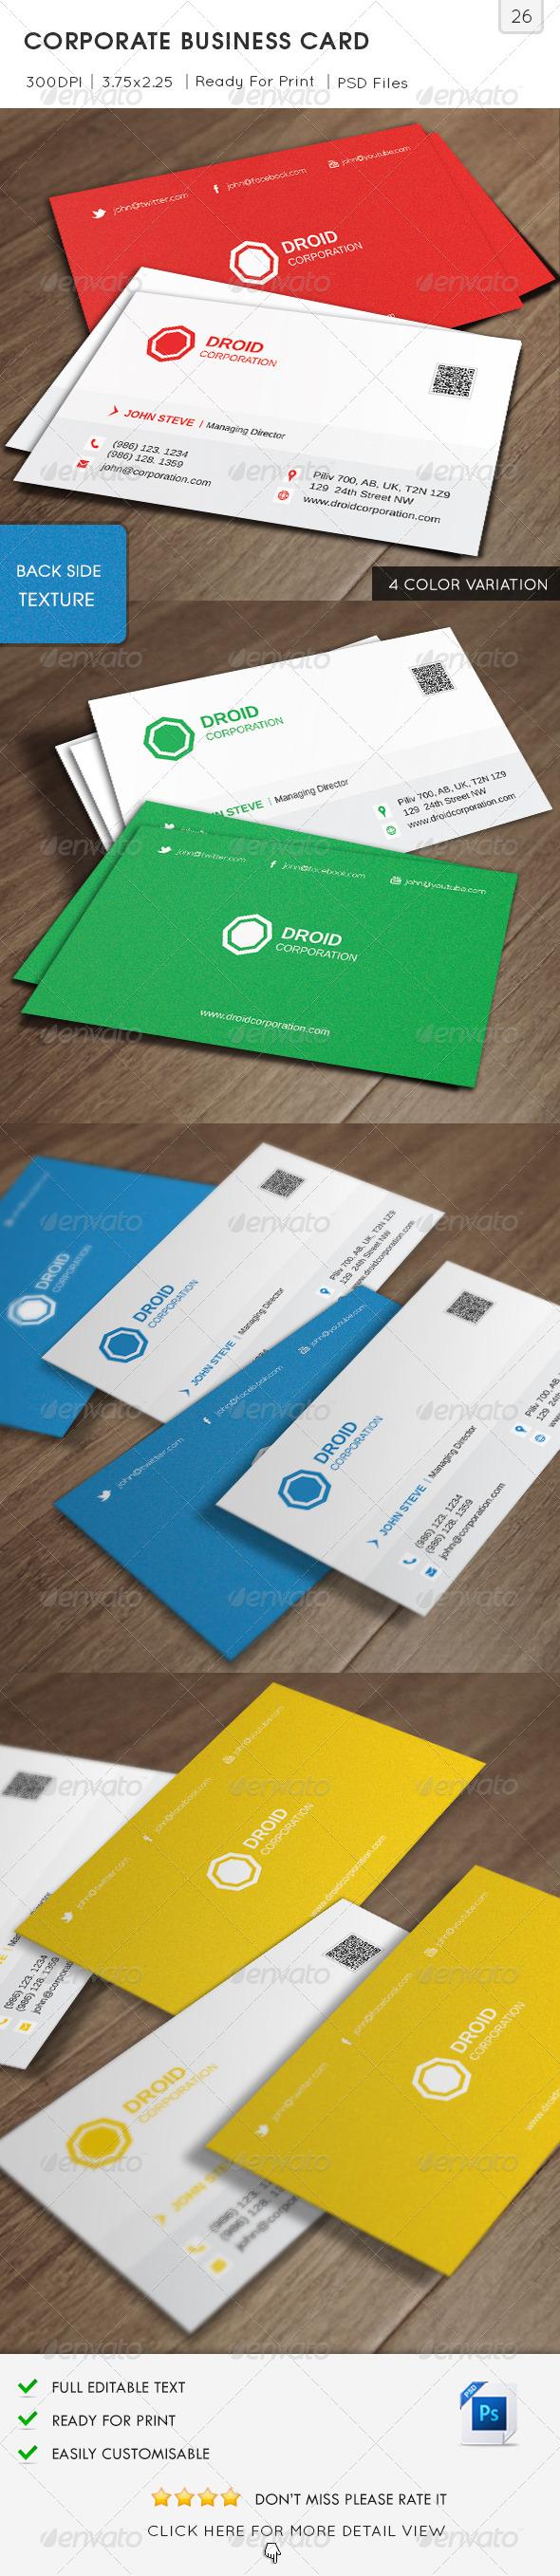 Corporate Business Card v26 - Corporate Business Cards